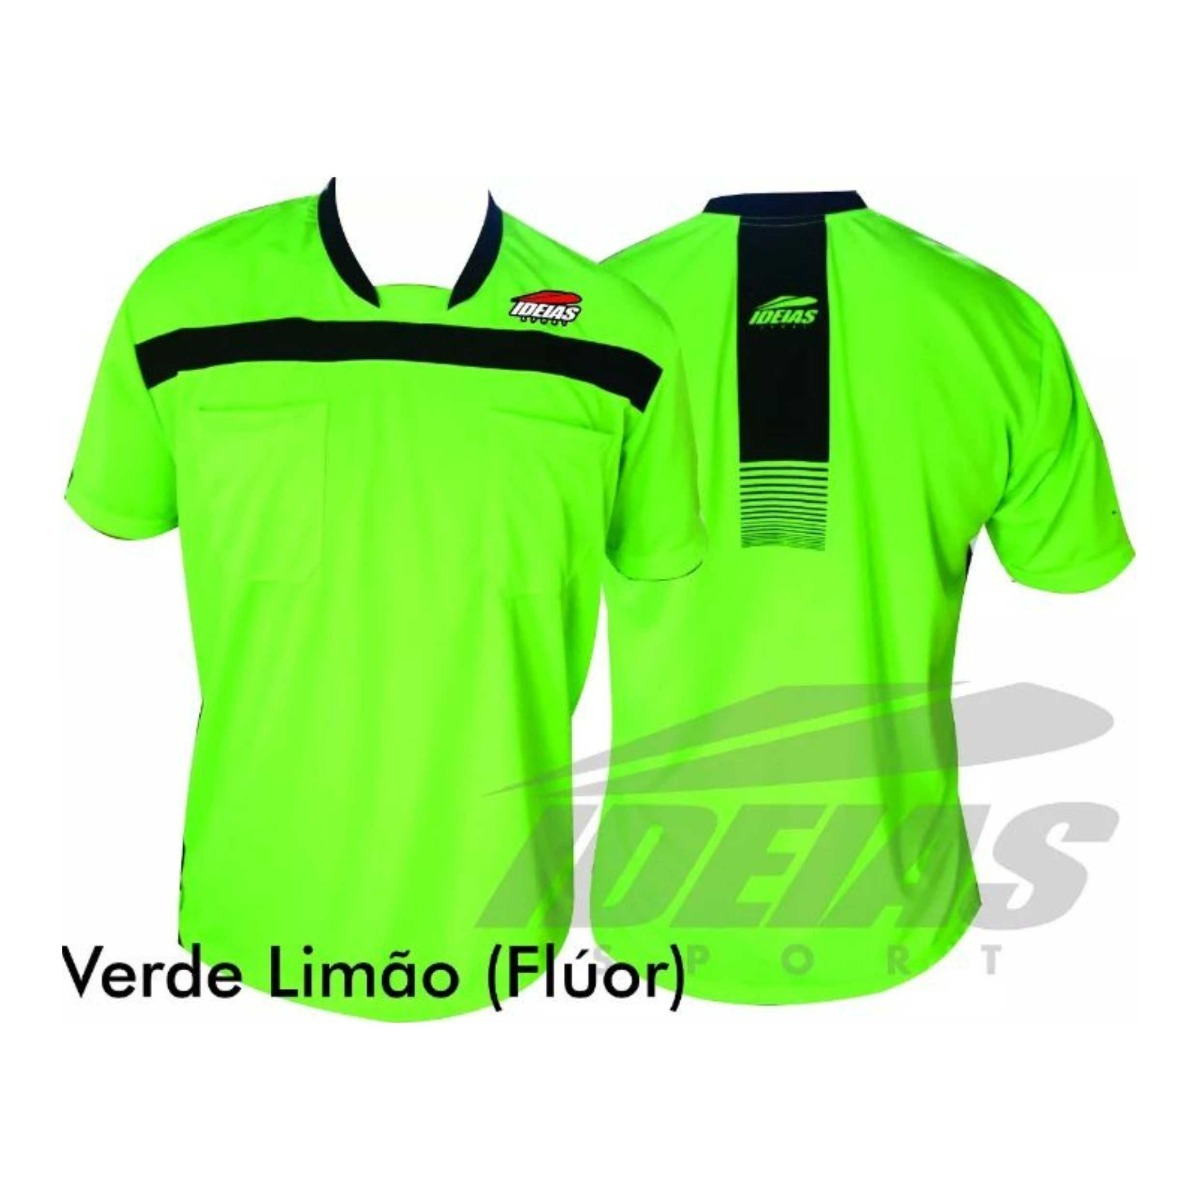 a7824b3238 Camisa Arbitro Arbitragem Futebol Socyet Escolha As Cores - R  43